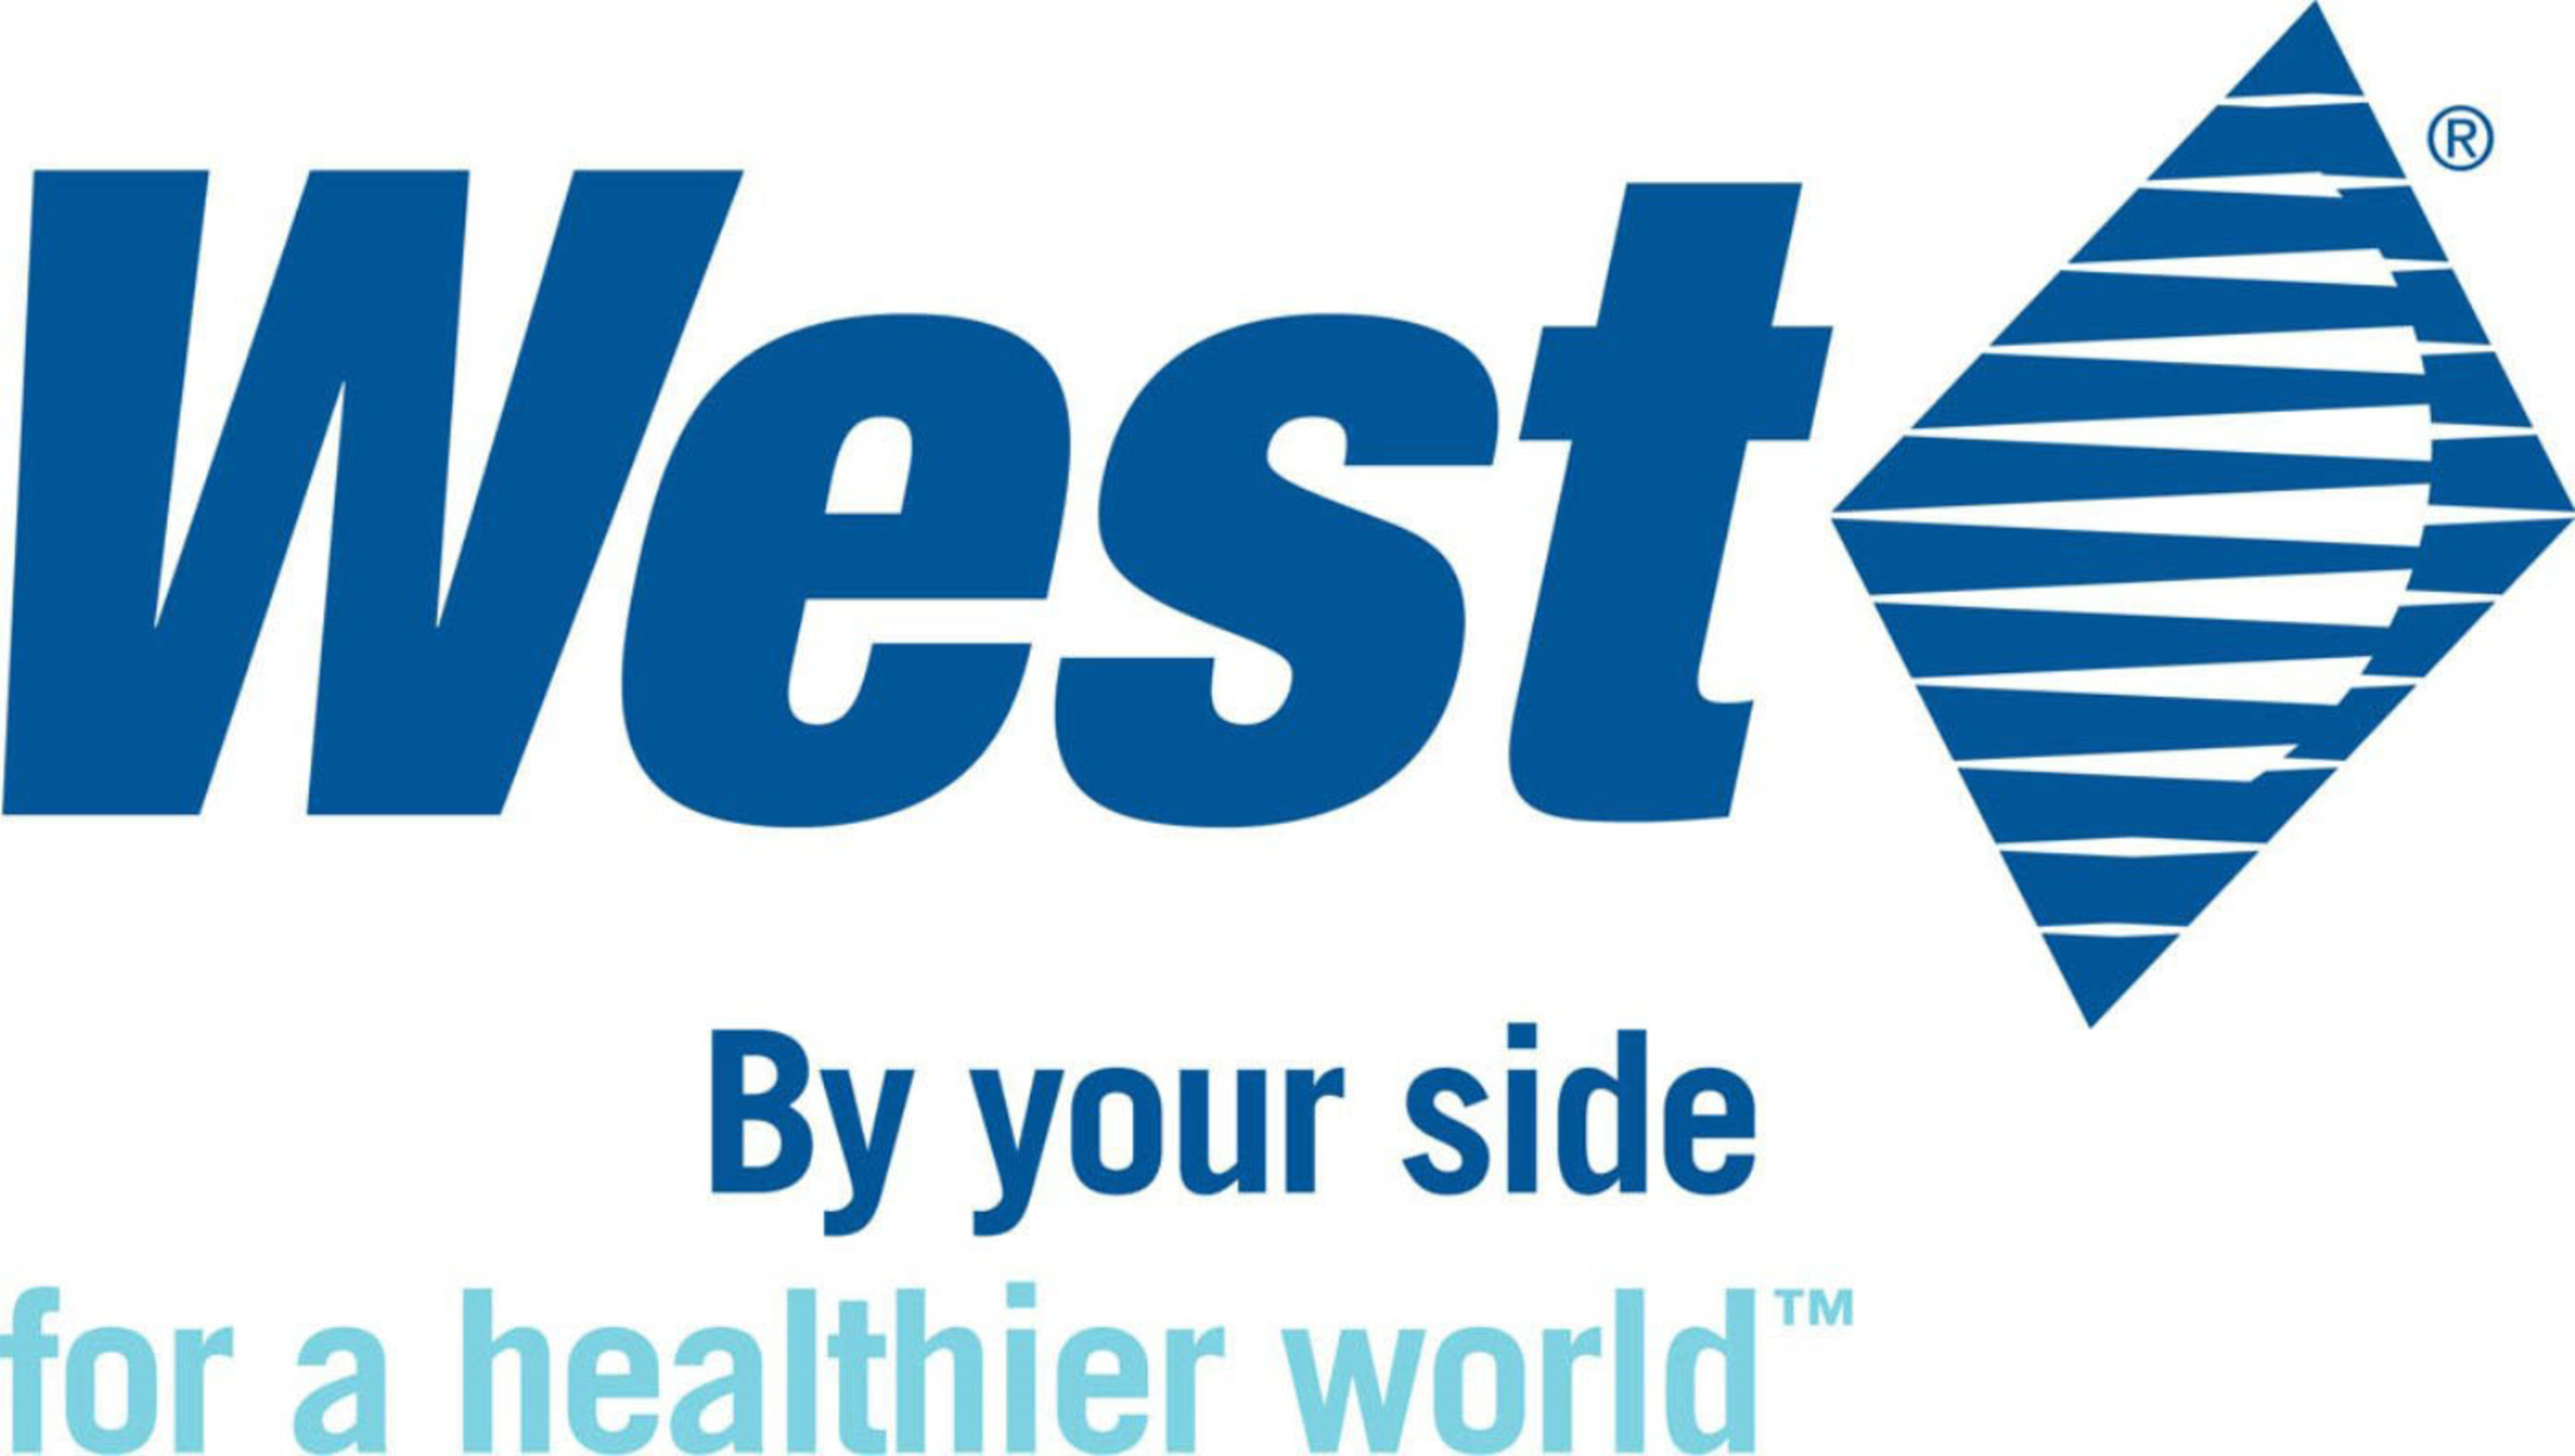 West Pharmaceutical Services logo. (PRNewsFoto/West)